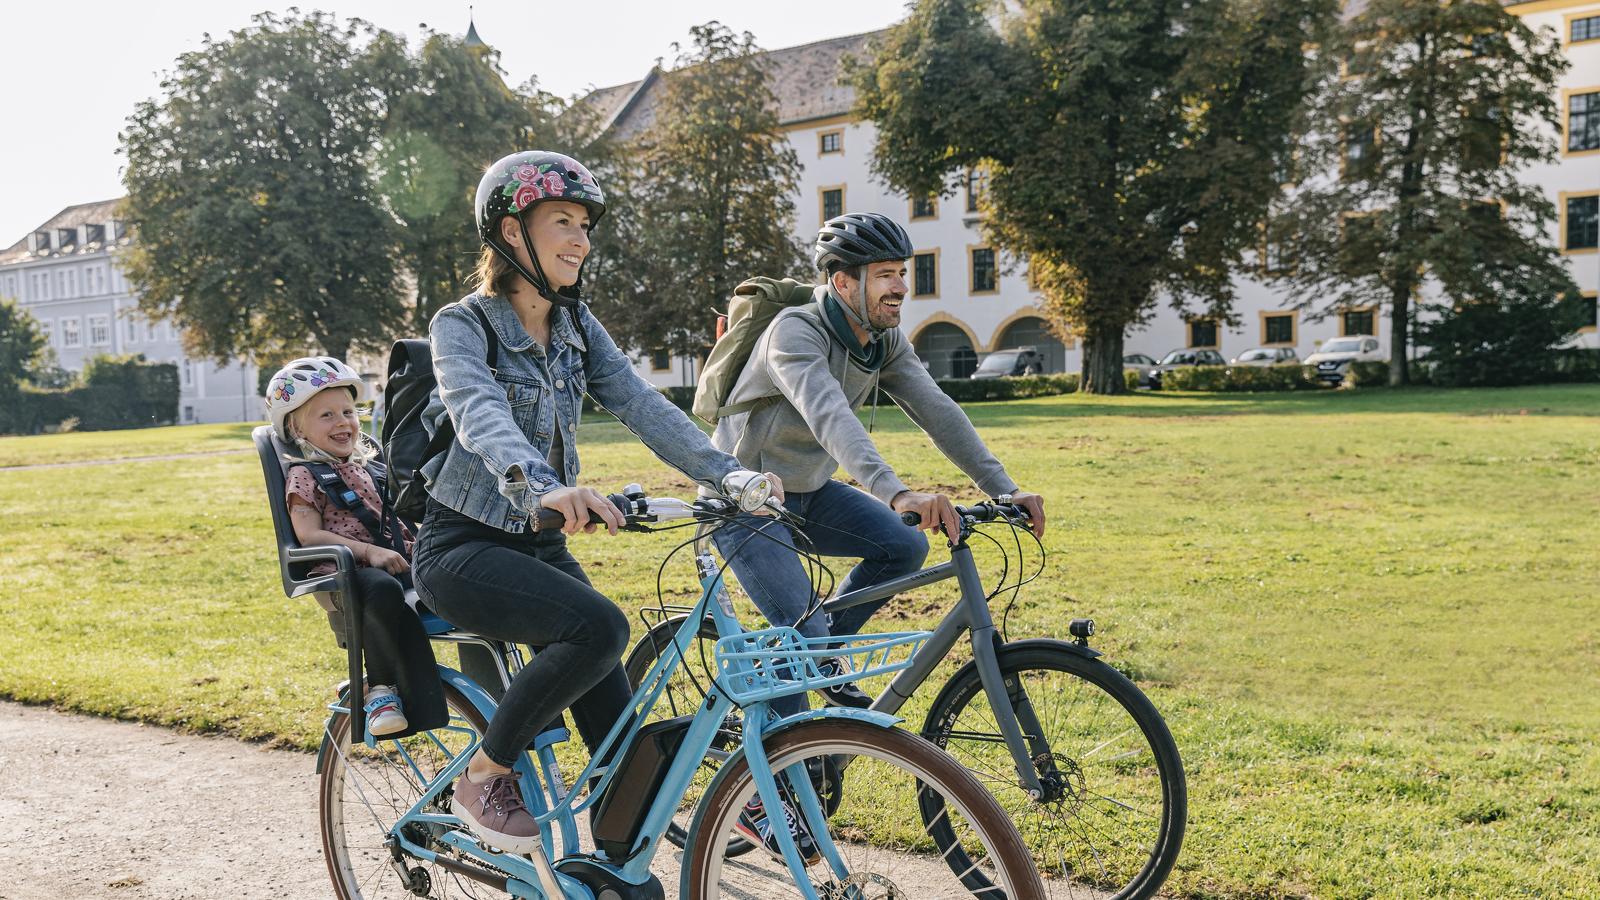 Familien-Radtour durch den Hofgarten in Kempten